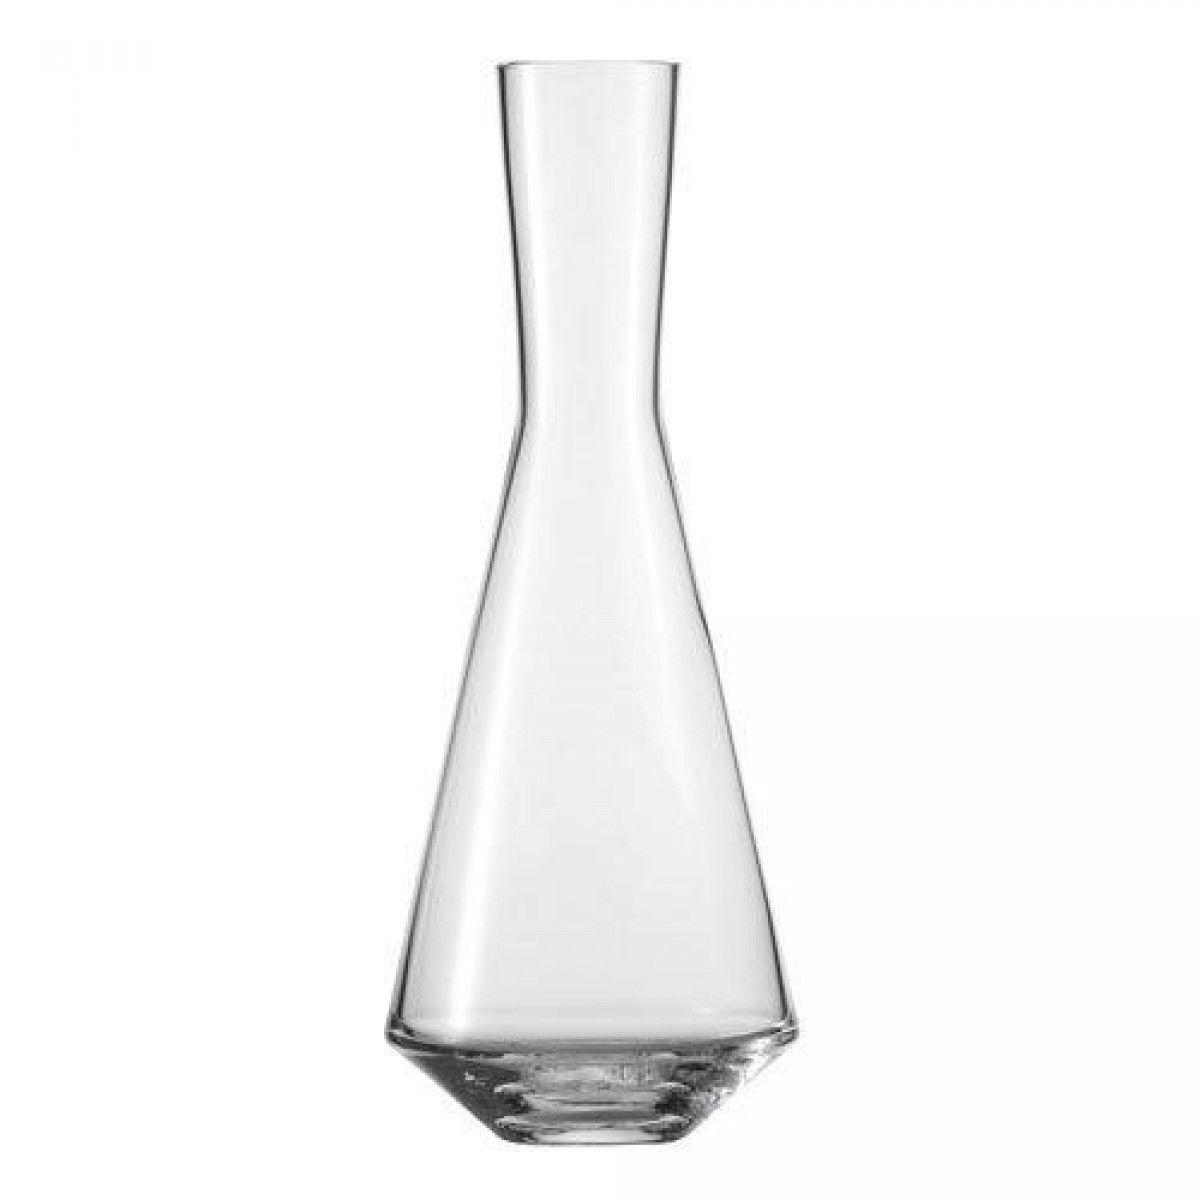 Decanter Para Vinho Branco 750 Ml  - Schott-Zwiesel Pure